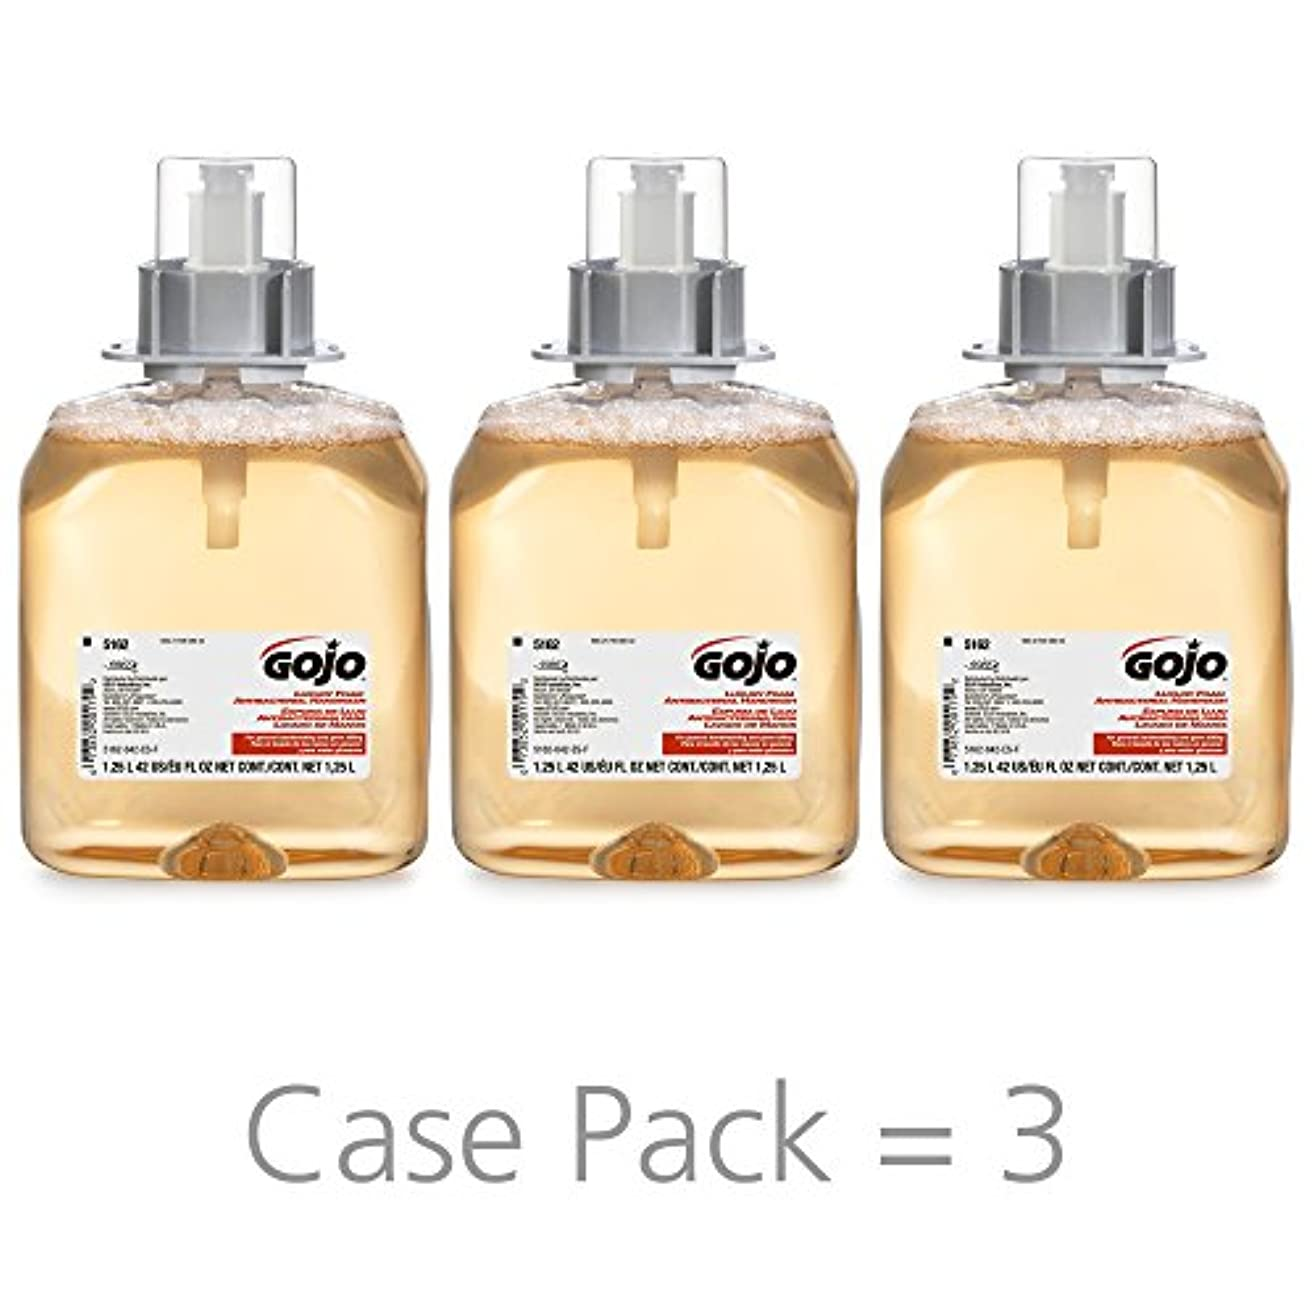 GOJO 516203CT FMX-12 Foam Hand Wash, Fresh Fruit, FMX-12 Dispenser, 1250mL Pump, 3/Carton by Gojo